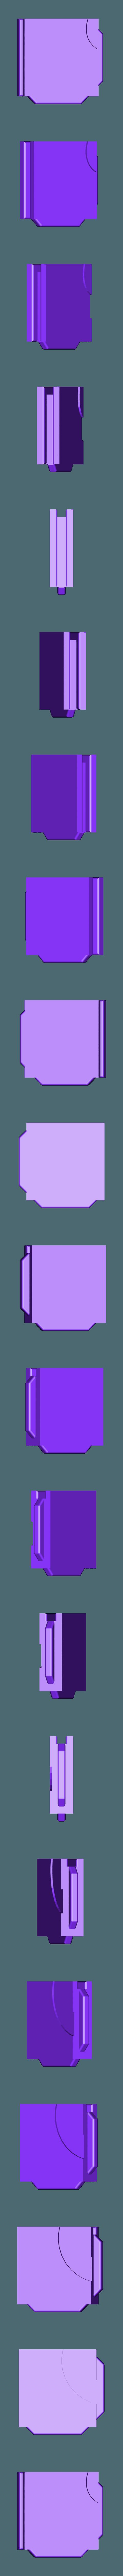 Piece - Part 16.stl Download free STL file Taquin CULTS / Sliding Puzzle • 3D print model, Valelab3D